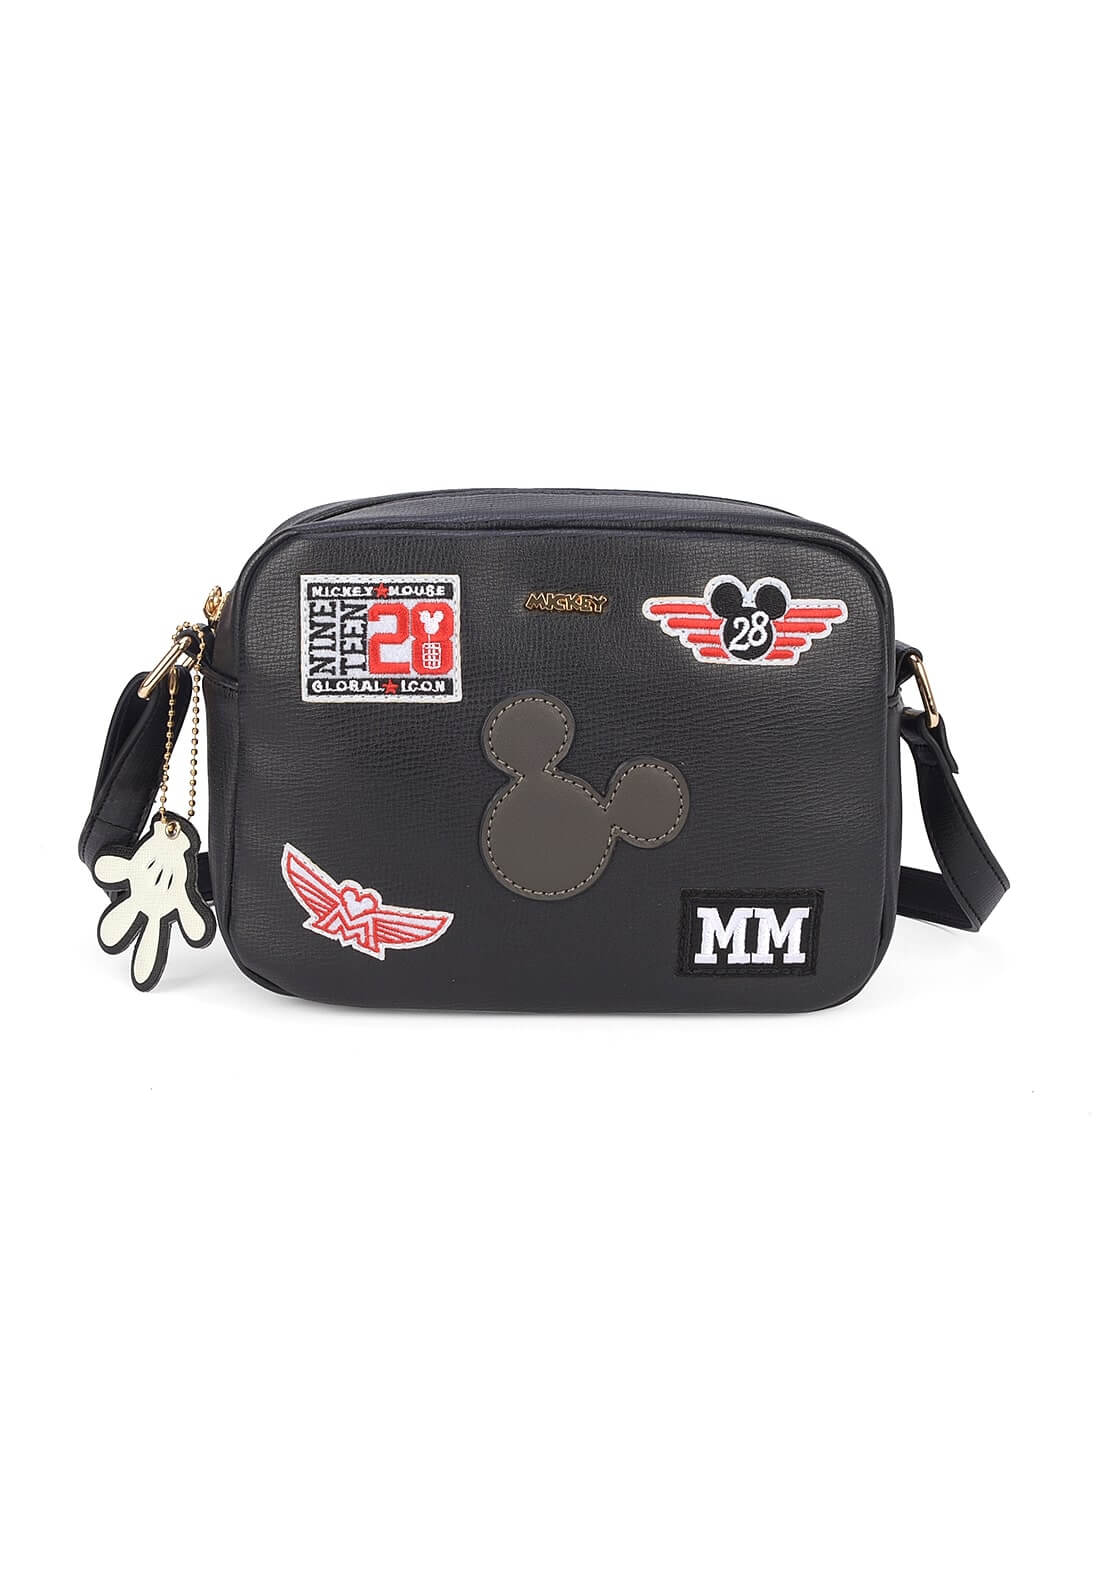 Bolsa Mickey Retrô Transversal Bottons Luvinha Original